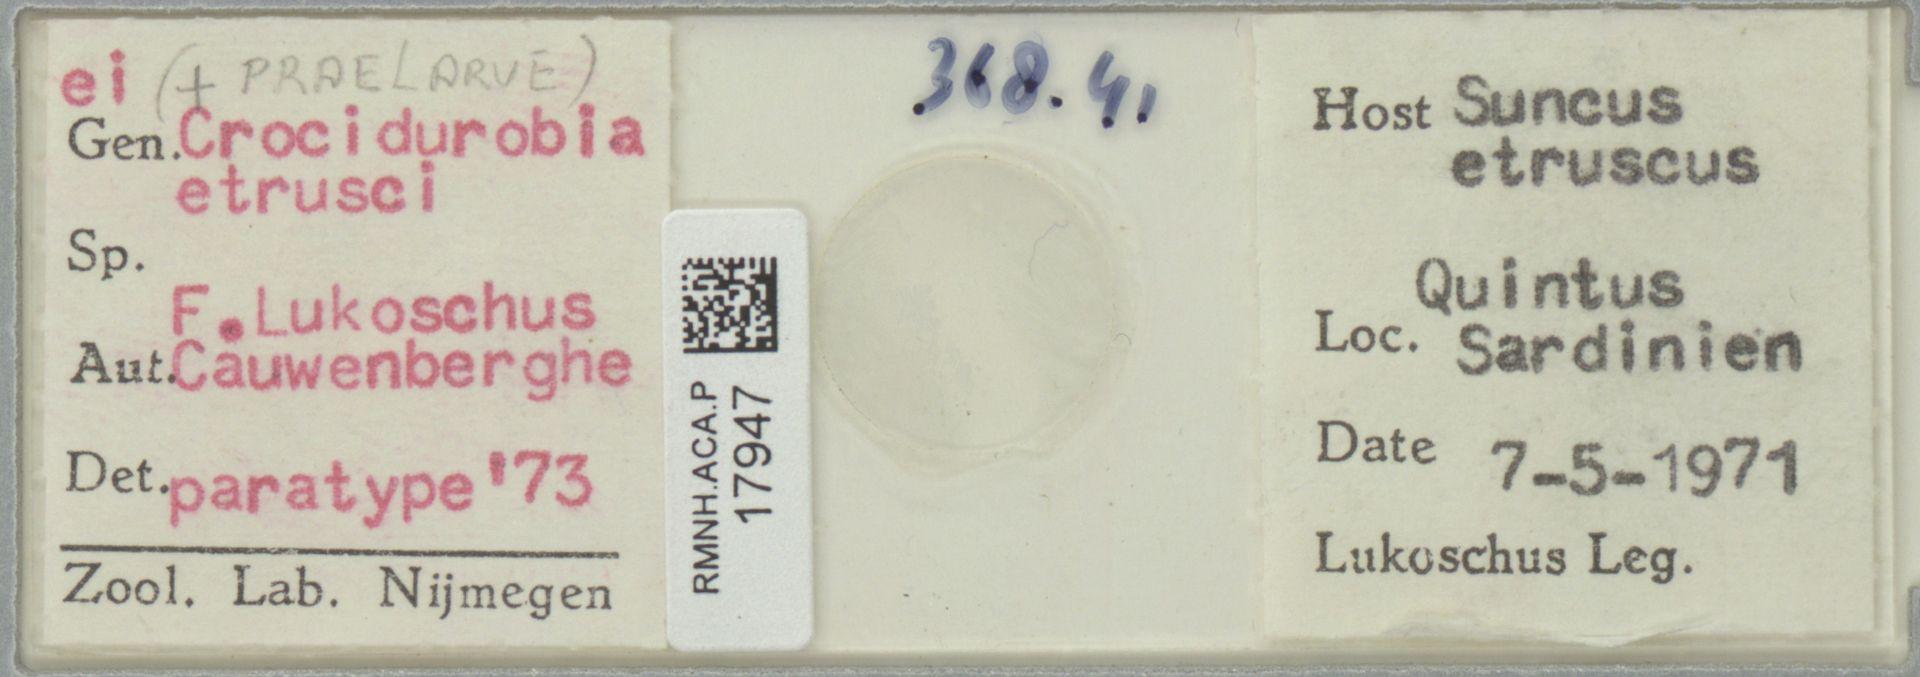 RMNH.ACA.P.17947 | Crocidurobia etrusci Lukoschus & Cauwenberghe, 1973